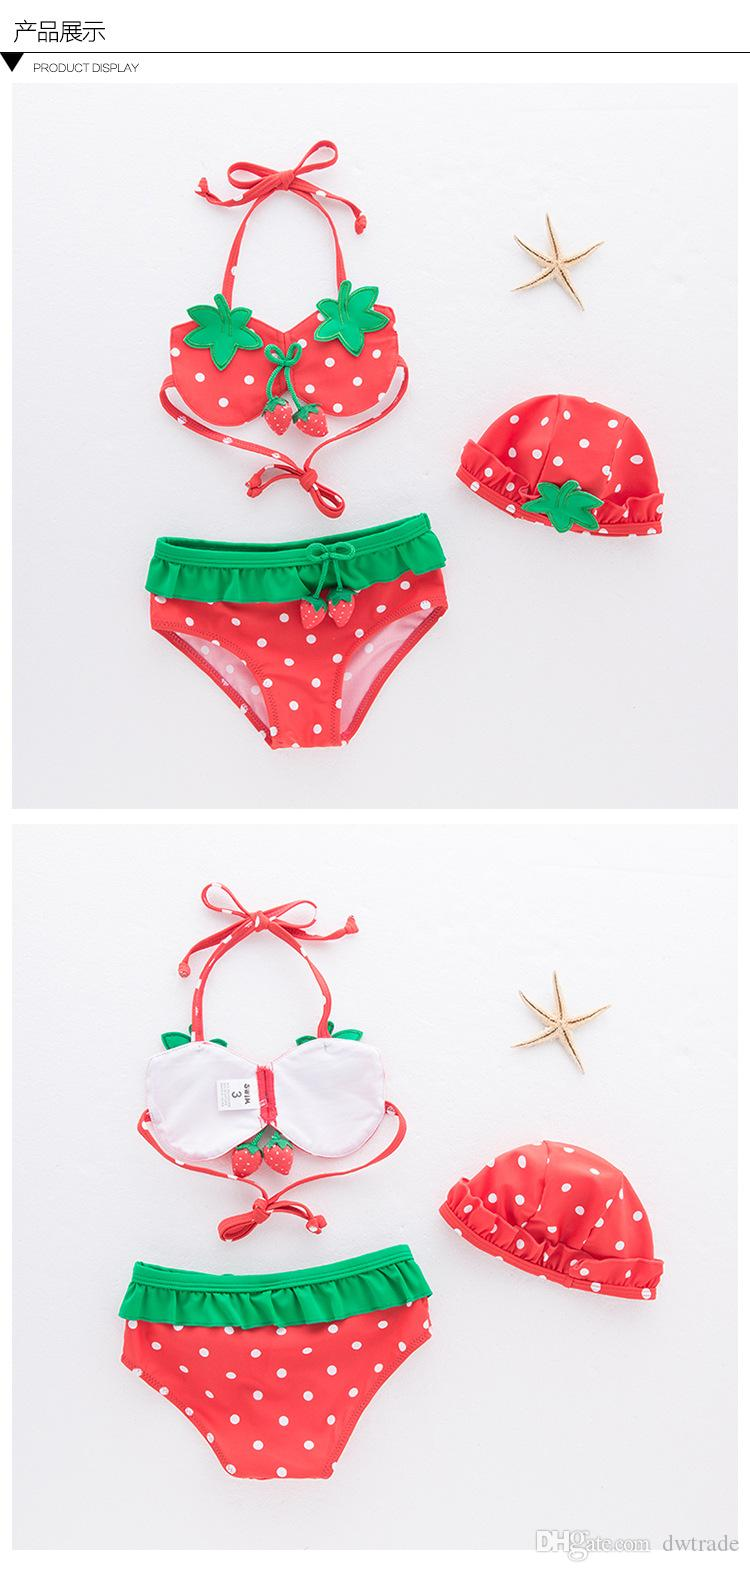 Cute Girls Strawberry Lace-up Halter Hanging Neck Split Swimsuits with Hat Bikini Spa Swimsuit Fresh Sling Swimwear